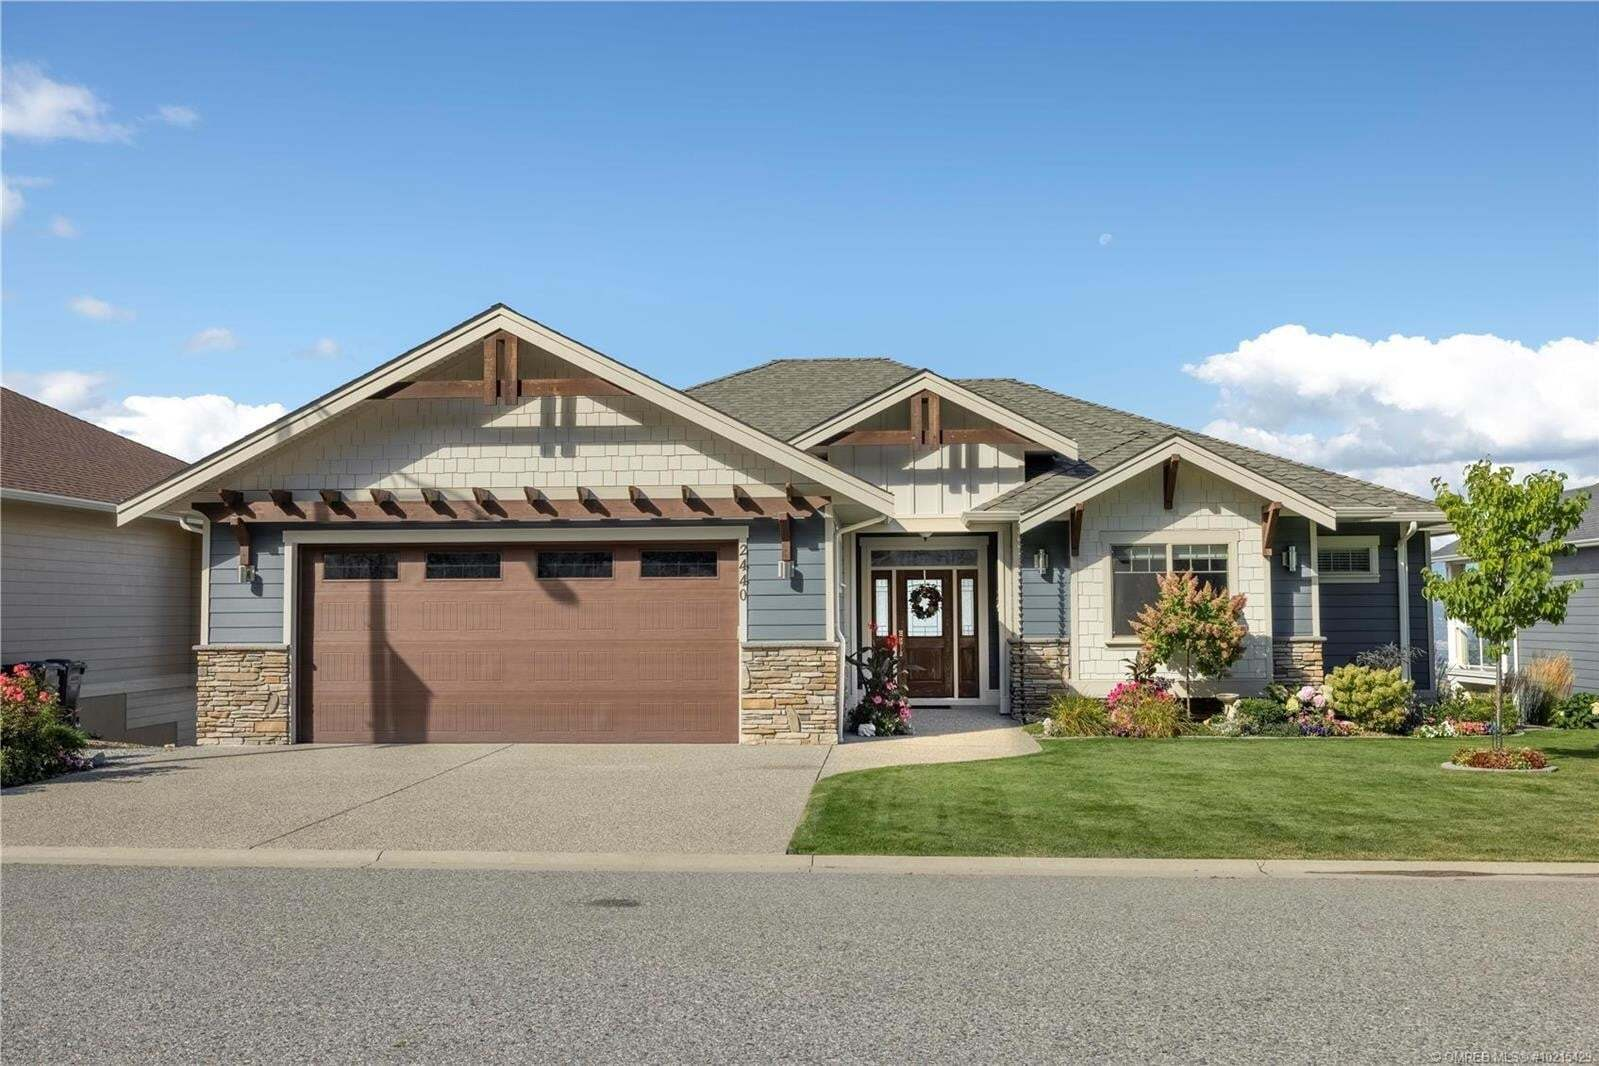 House for sale at 2440 Loseth Rd Kelowna British Columbia - MLS: 10215429